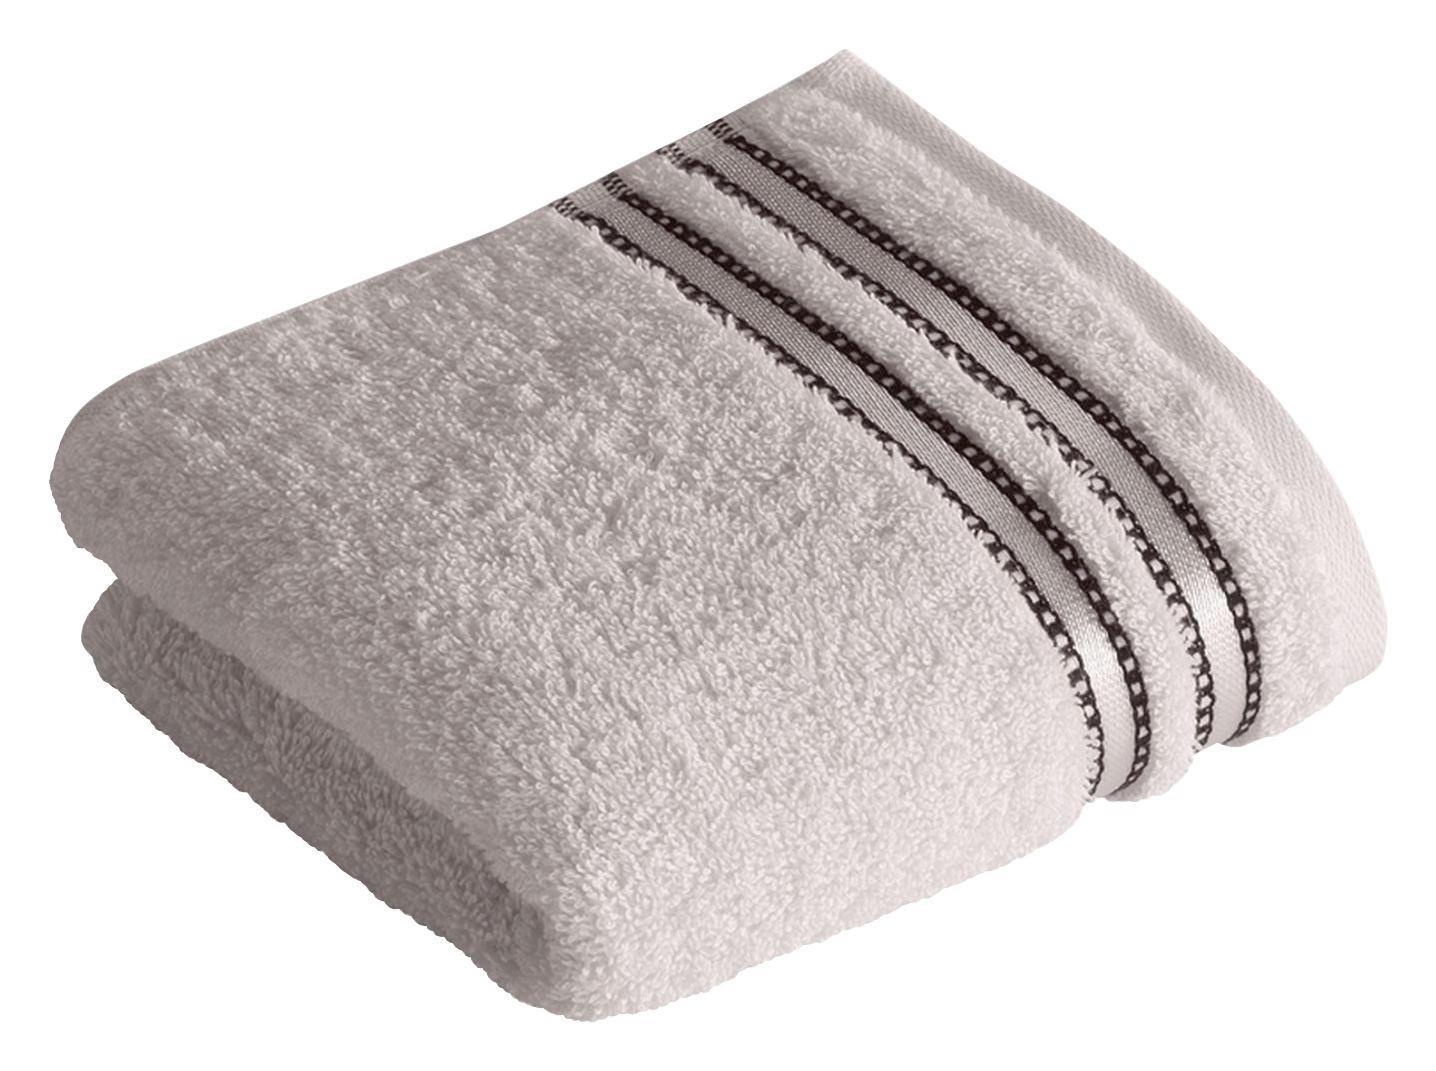 RUČNIK ZA GOSTE - svijetlo siva, Basics, tekstil (30/50cm) - VOSSEN